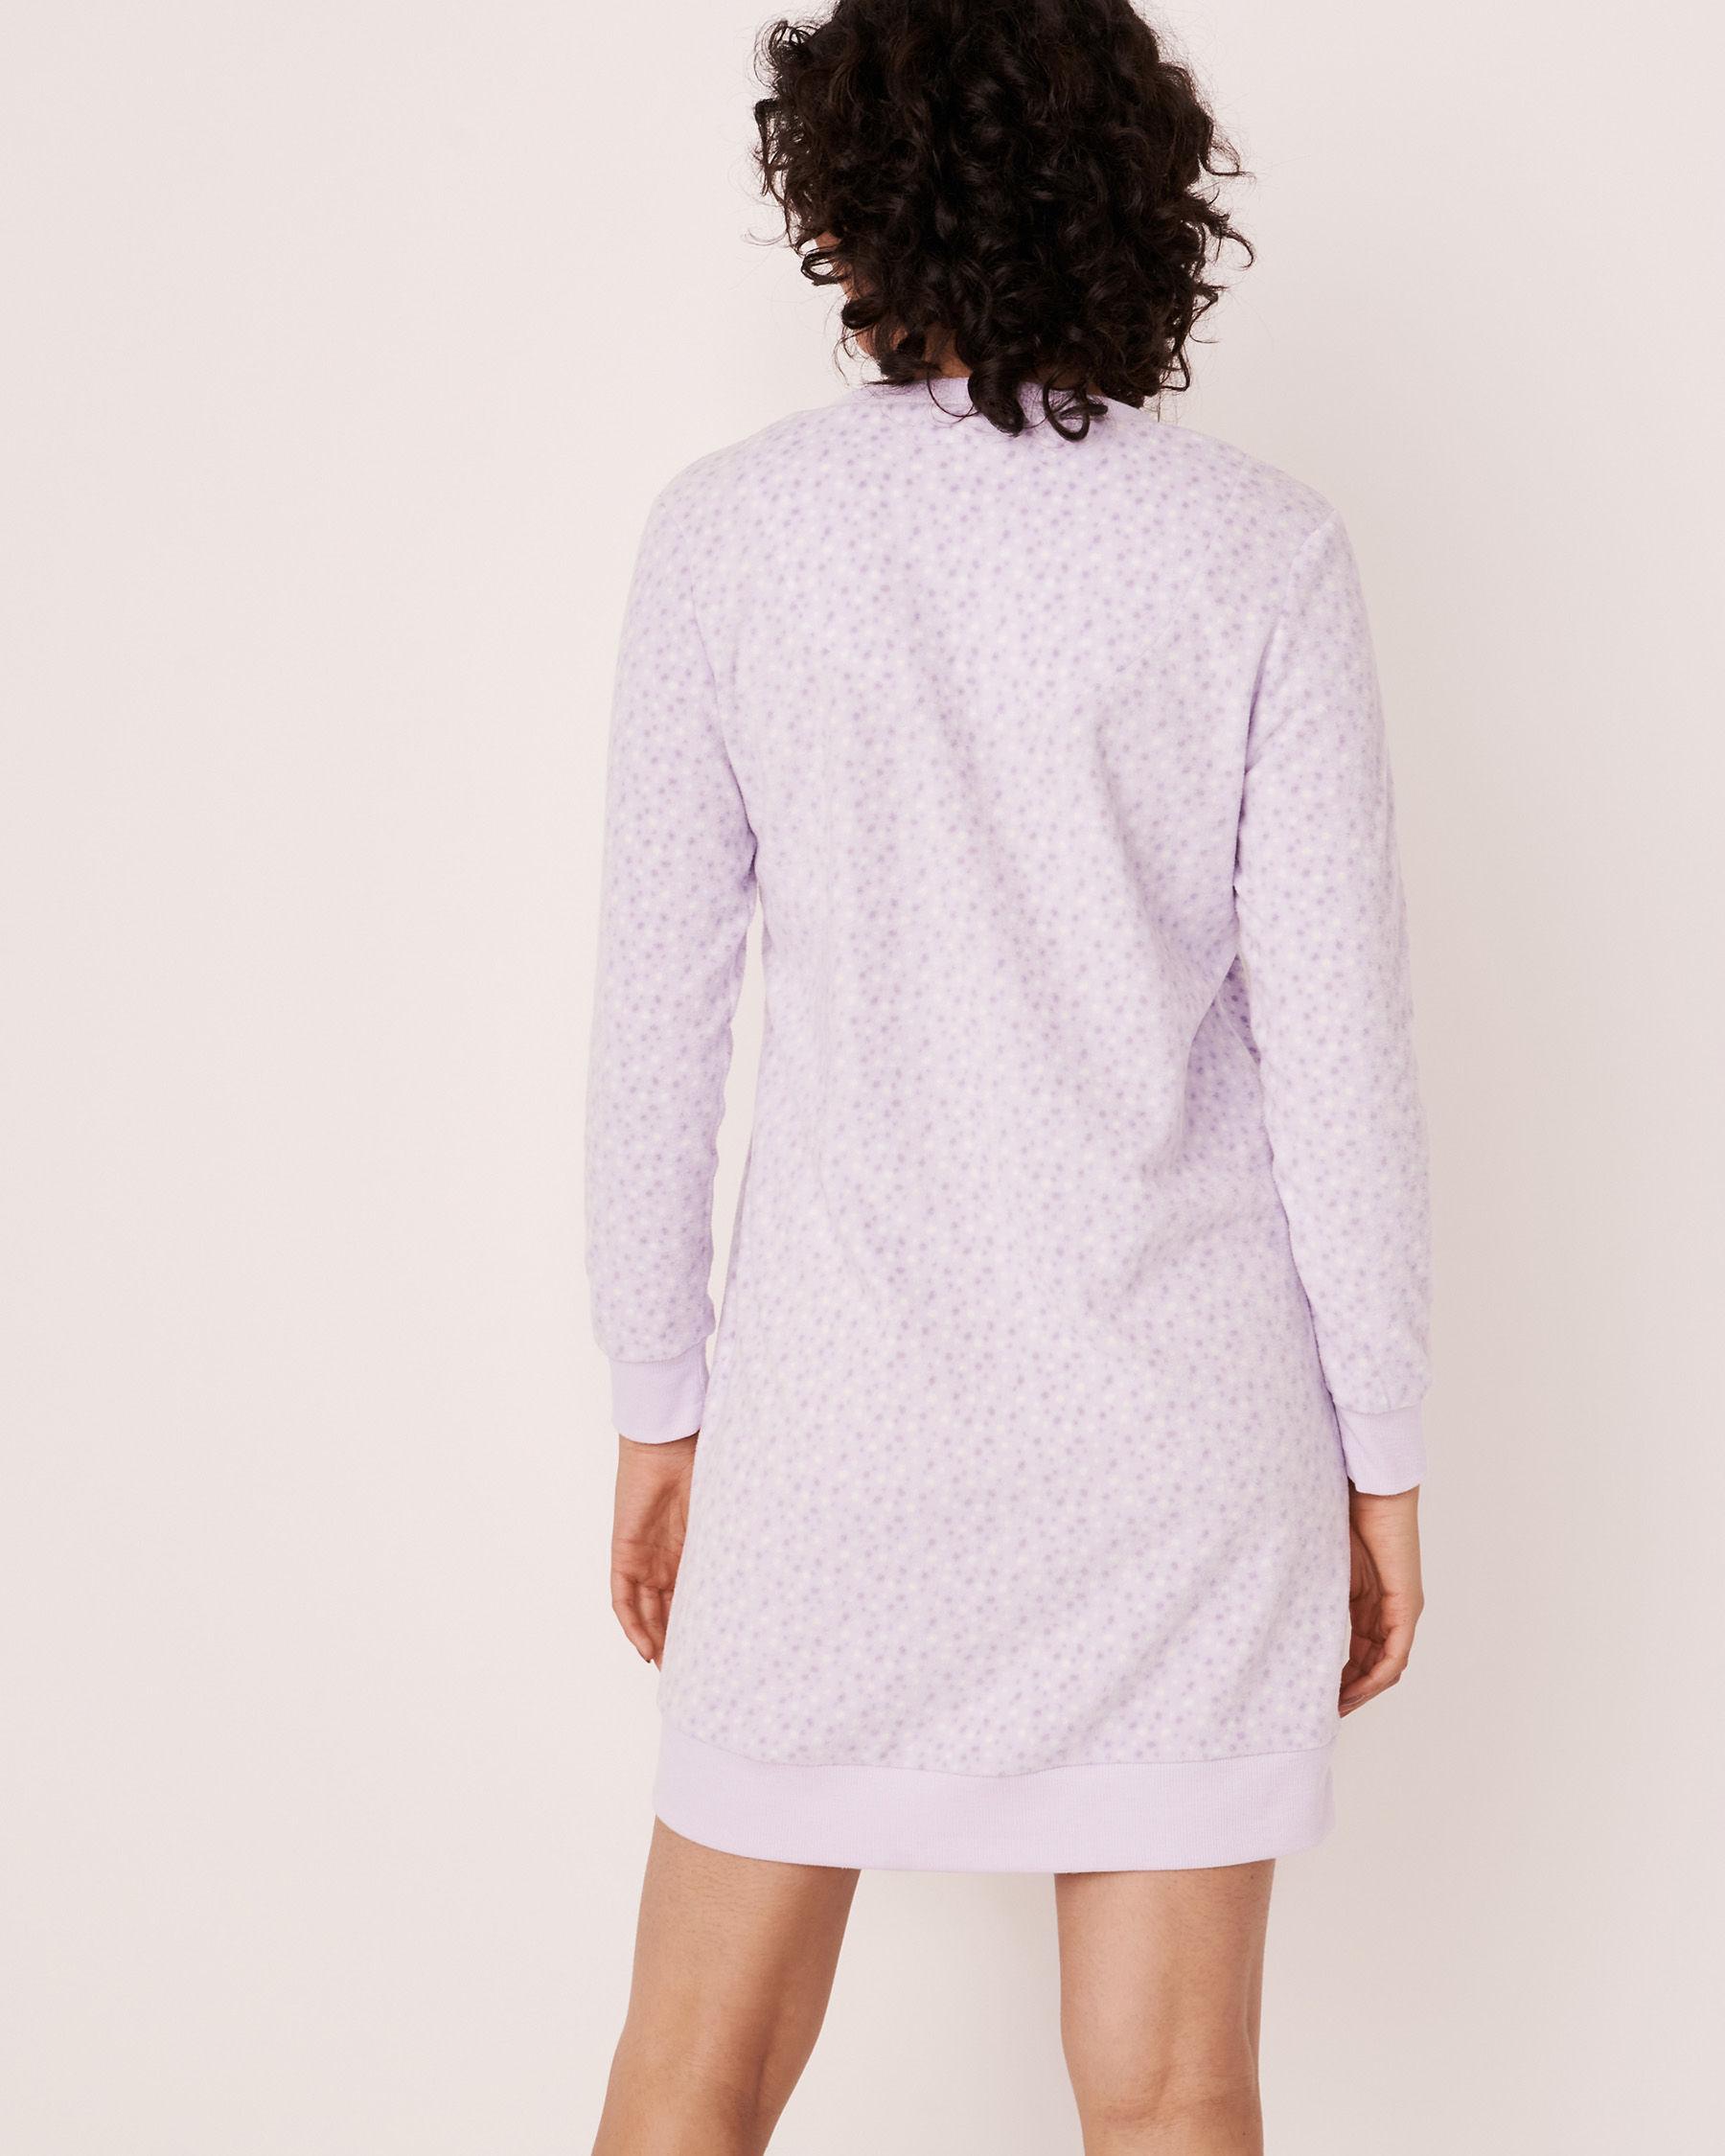 LA VIE EN ROSE Micropolar Long Sleeve Sleepshirt Multi dots 40500098 - View2